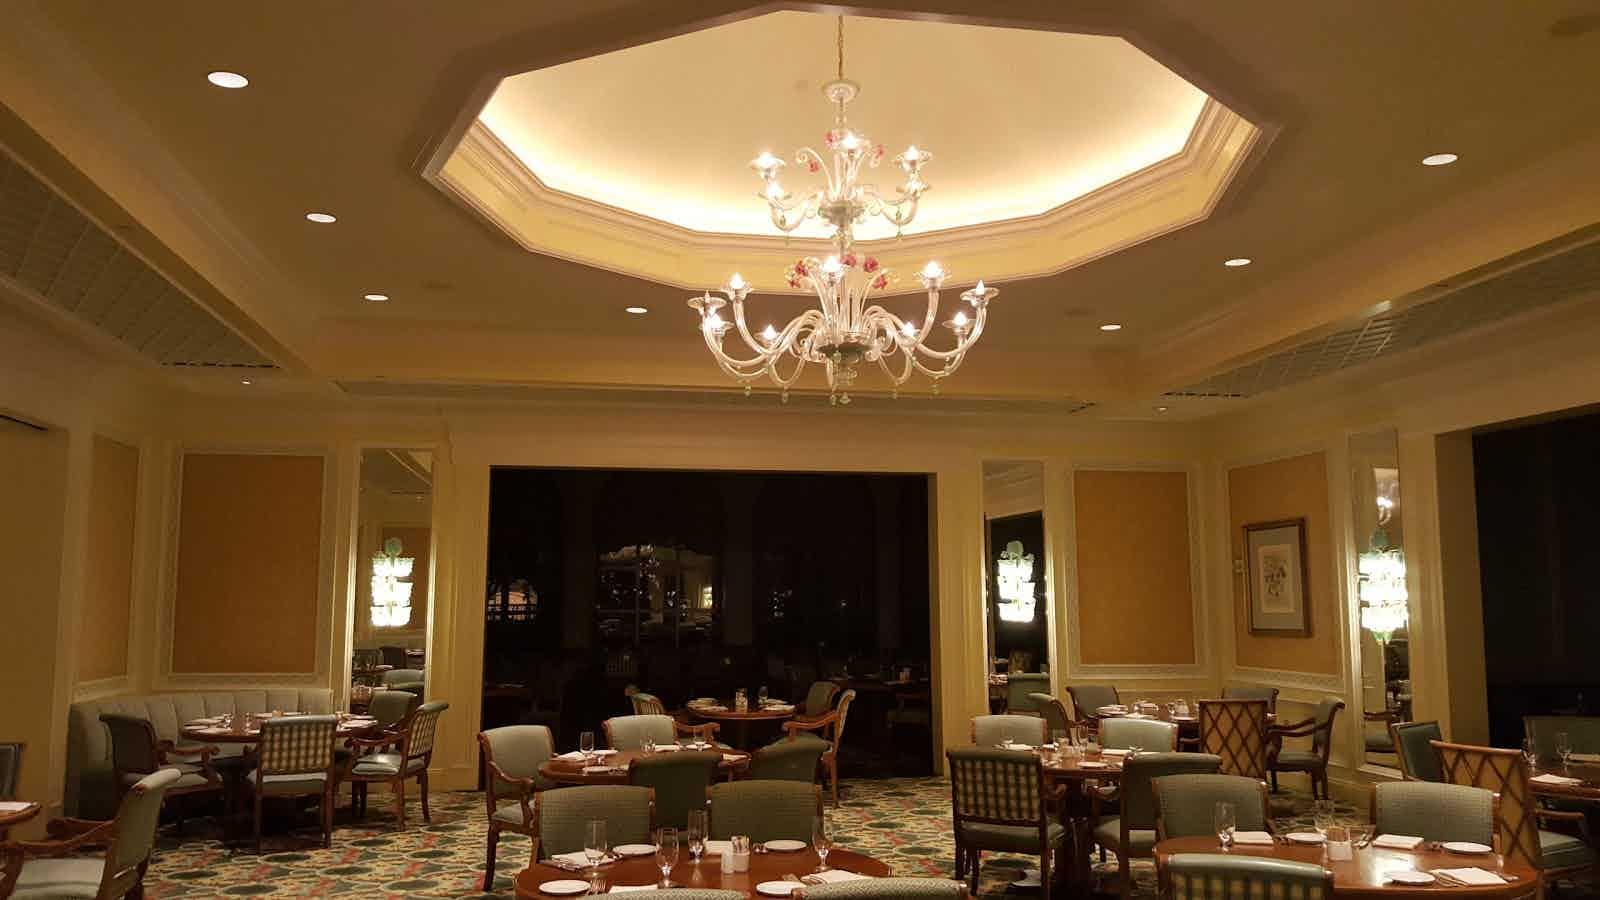 Garden Cafe - Salt Lake City | Restaurant Review - Zagat